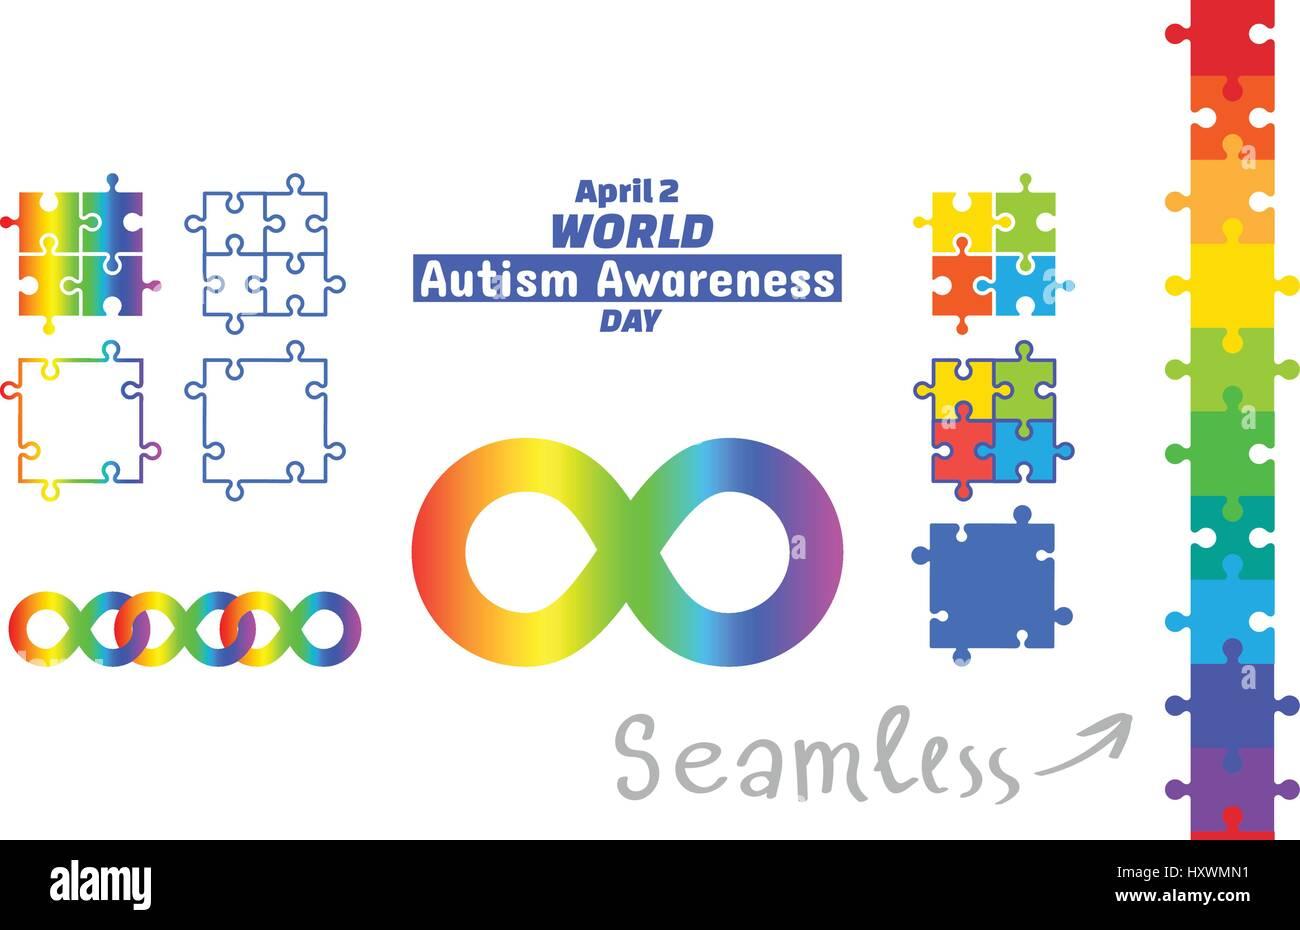 World Autism Awareness Day April 2 Set Of Design Elements Rainbow